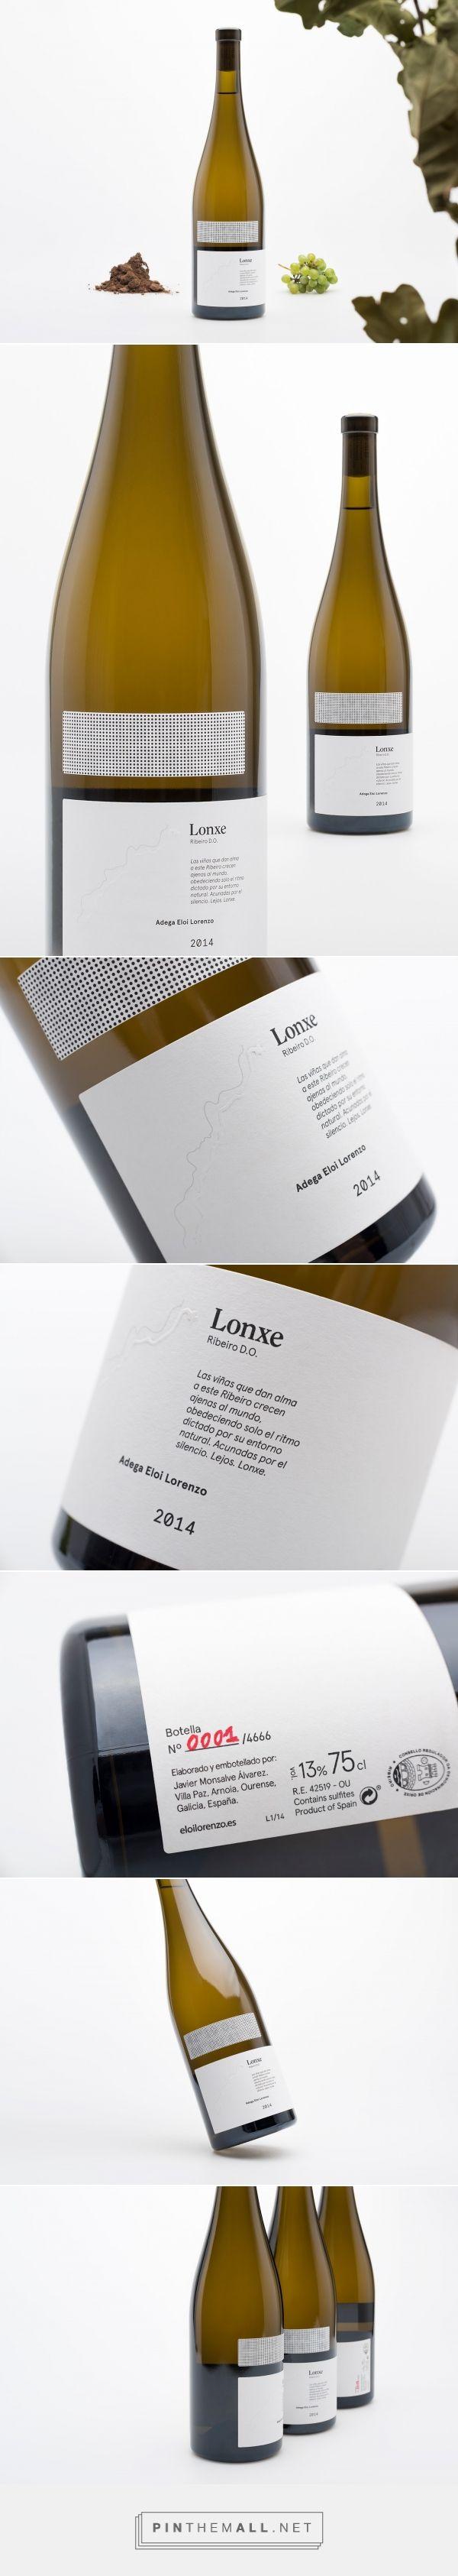 Lonxe Wine - Packaging of the World - Creative Package Design Gallery - http://www.packagingoftheworld.com/2016/11/lonxe.html